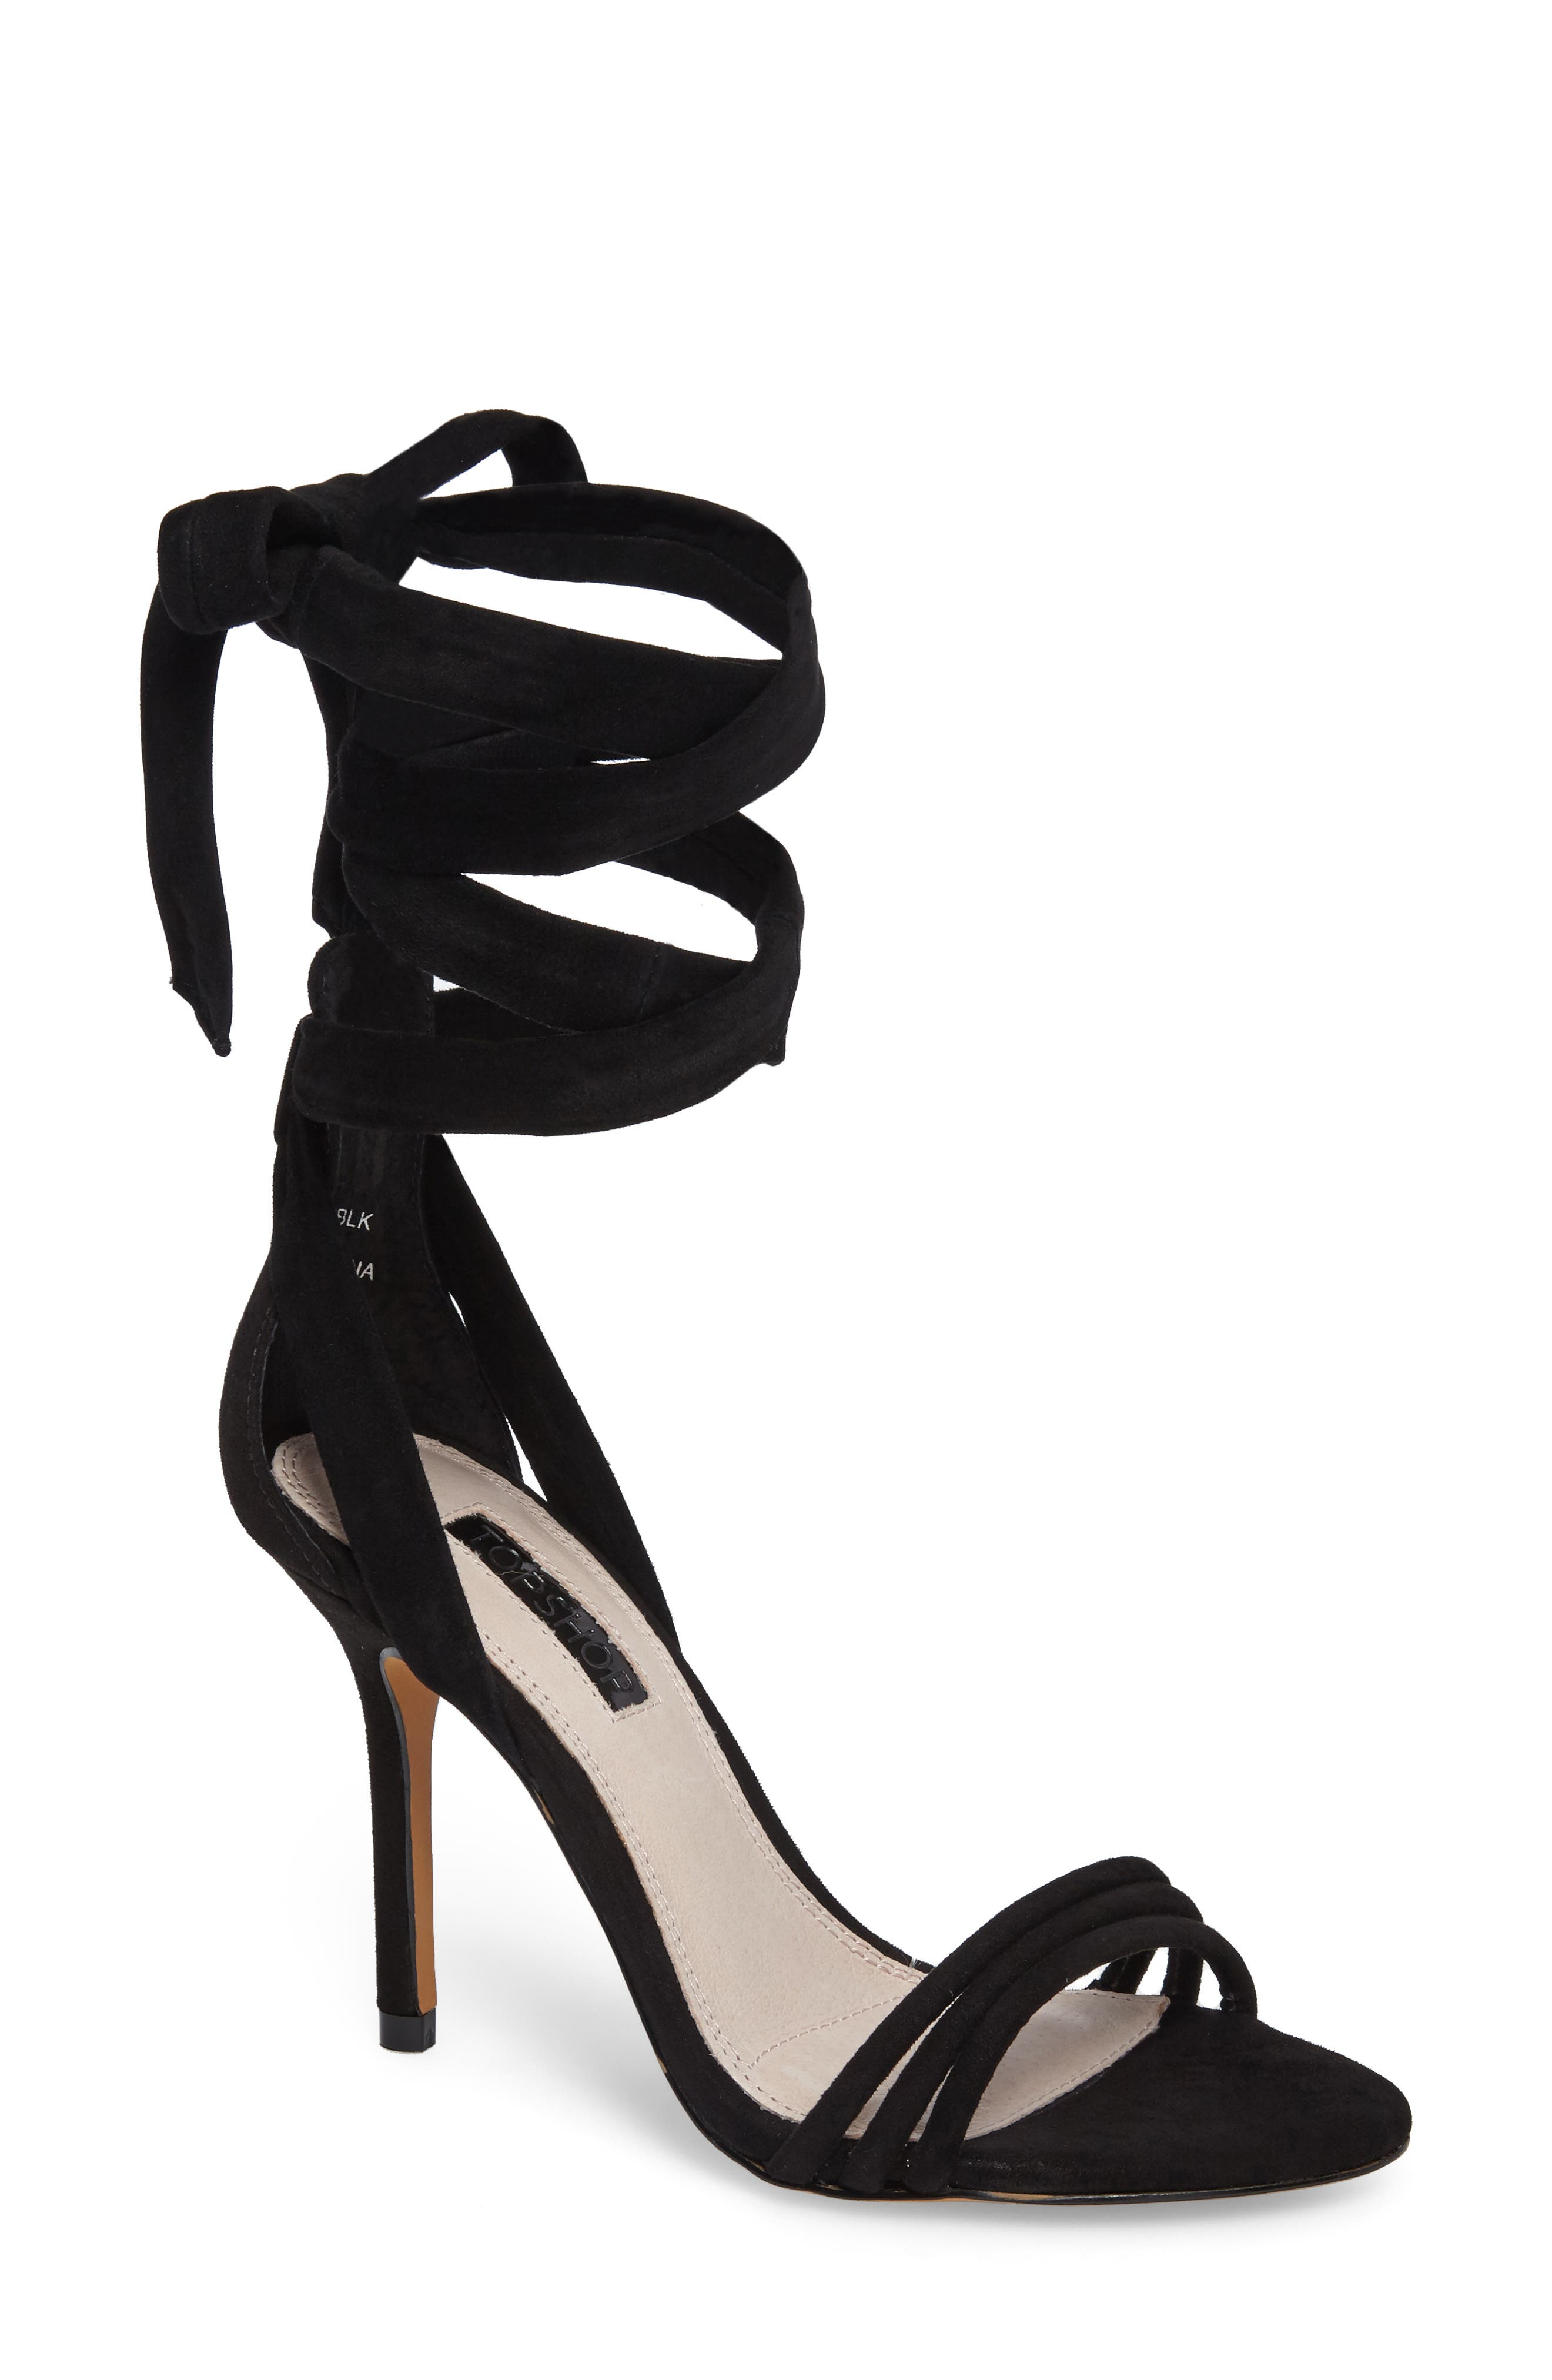 TOPSHOP, Ramona Ankle Wrap Sandal, Main thumbnail 1, color, 001